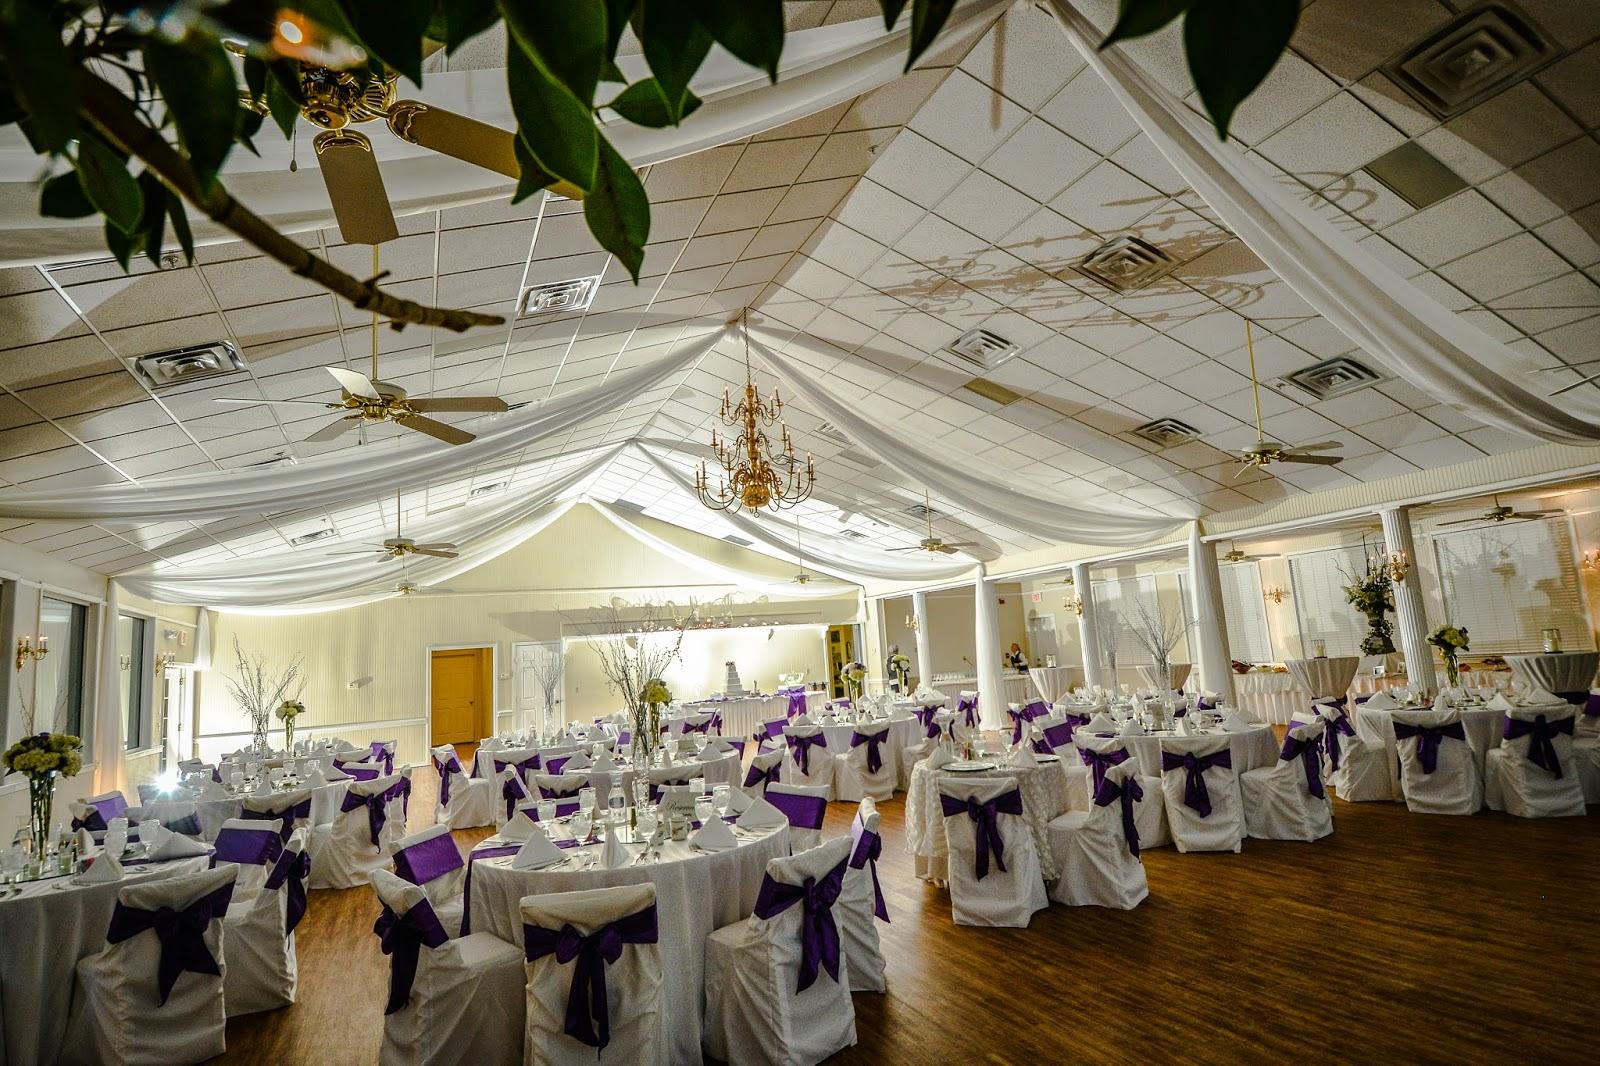 Walnut Creek Chapel Wedding Received 2017 Oklahoma City Award